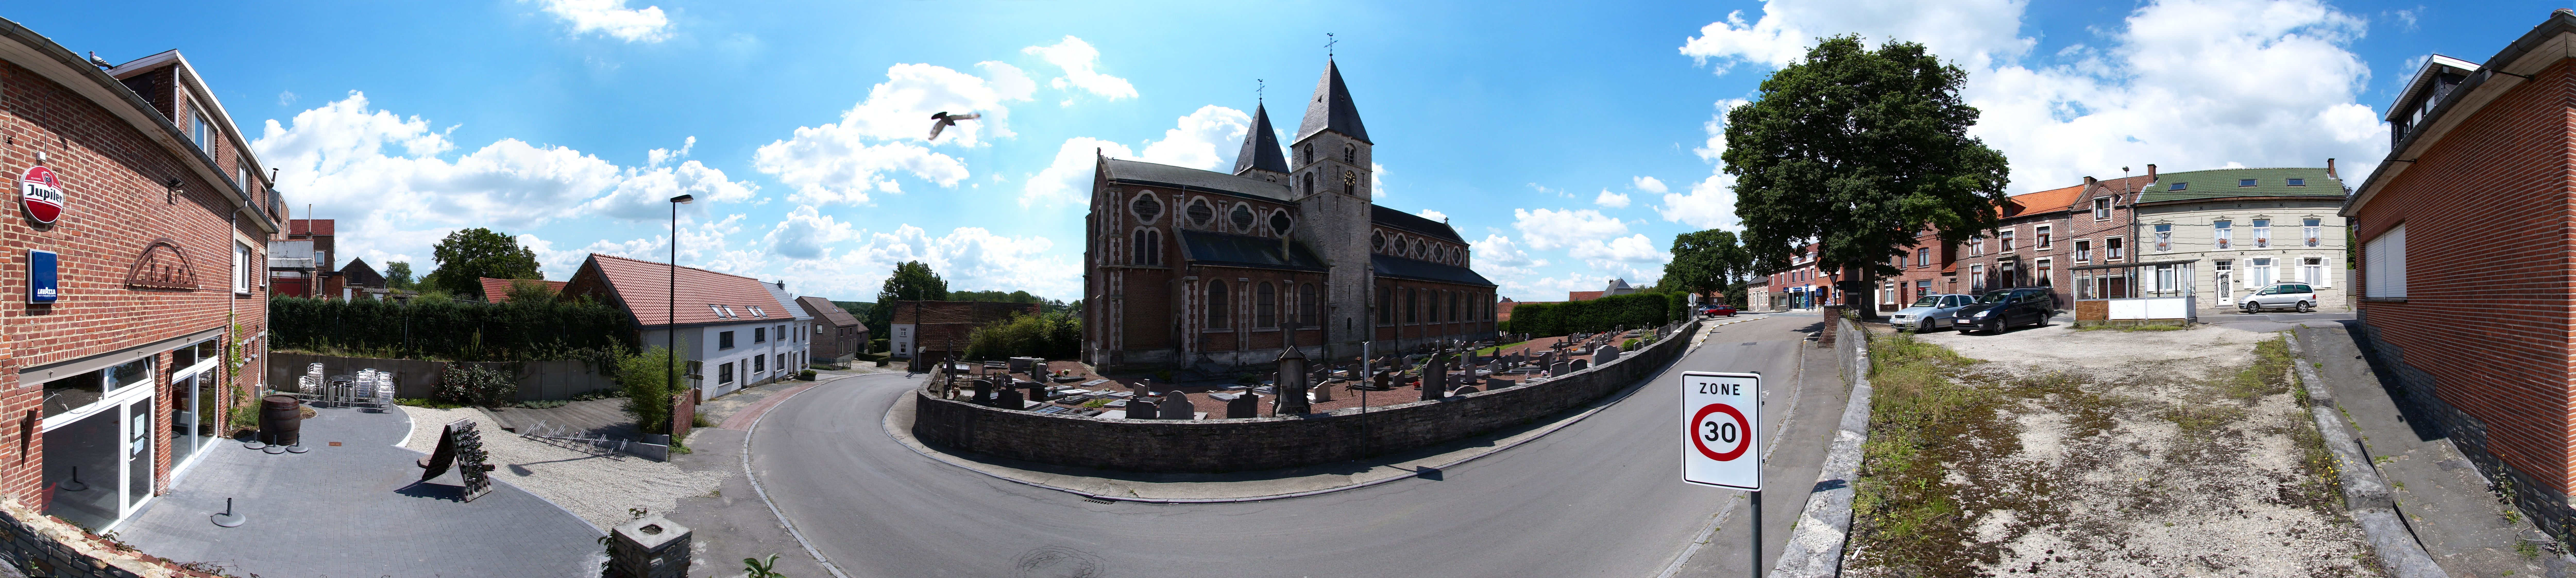 File Neerijse Panorama360 Jpg Wikimedia Commons